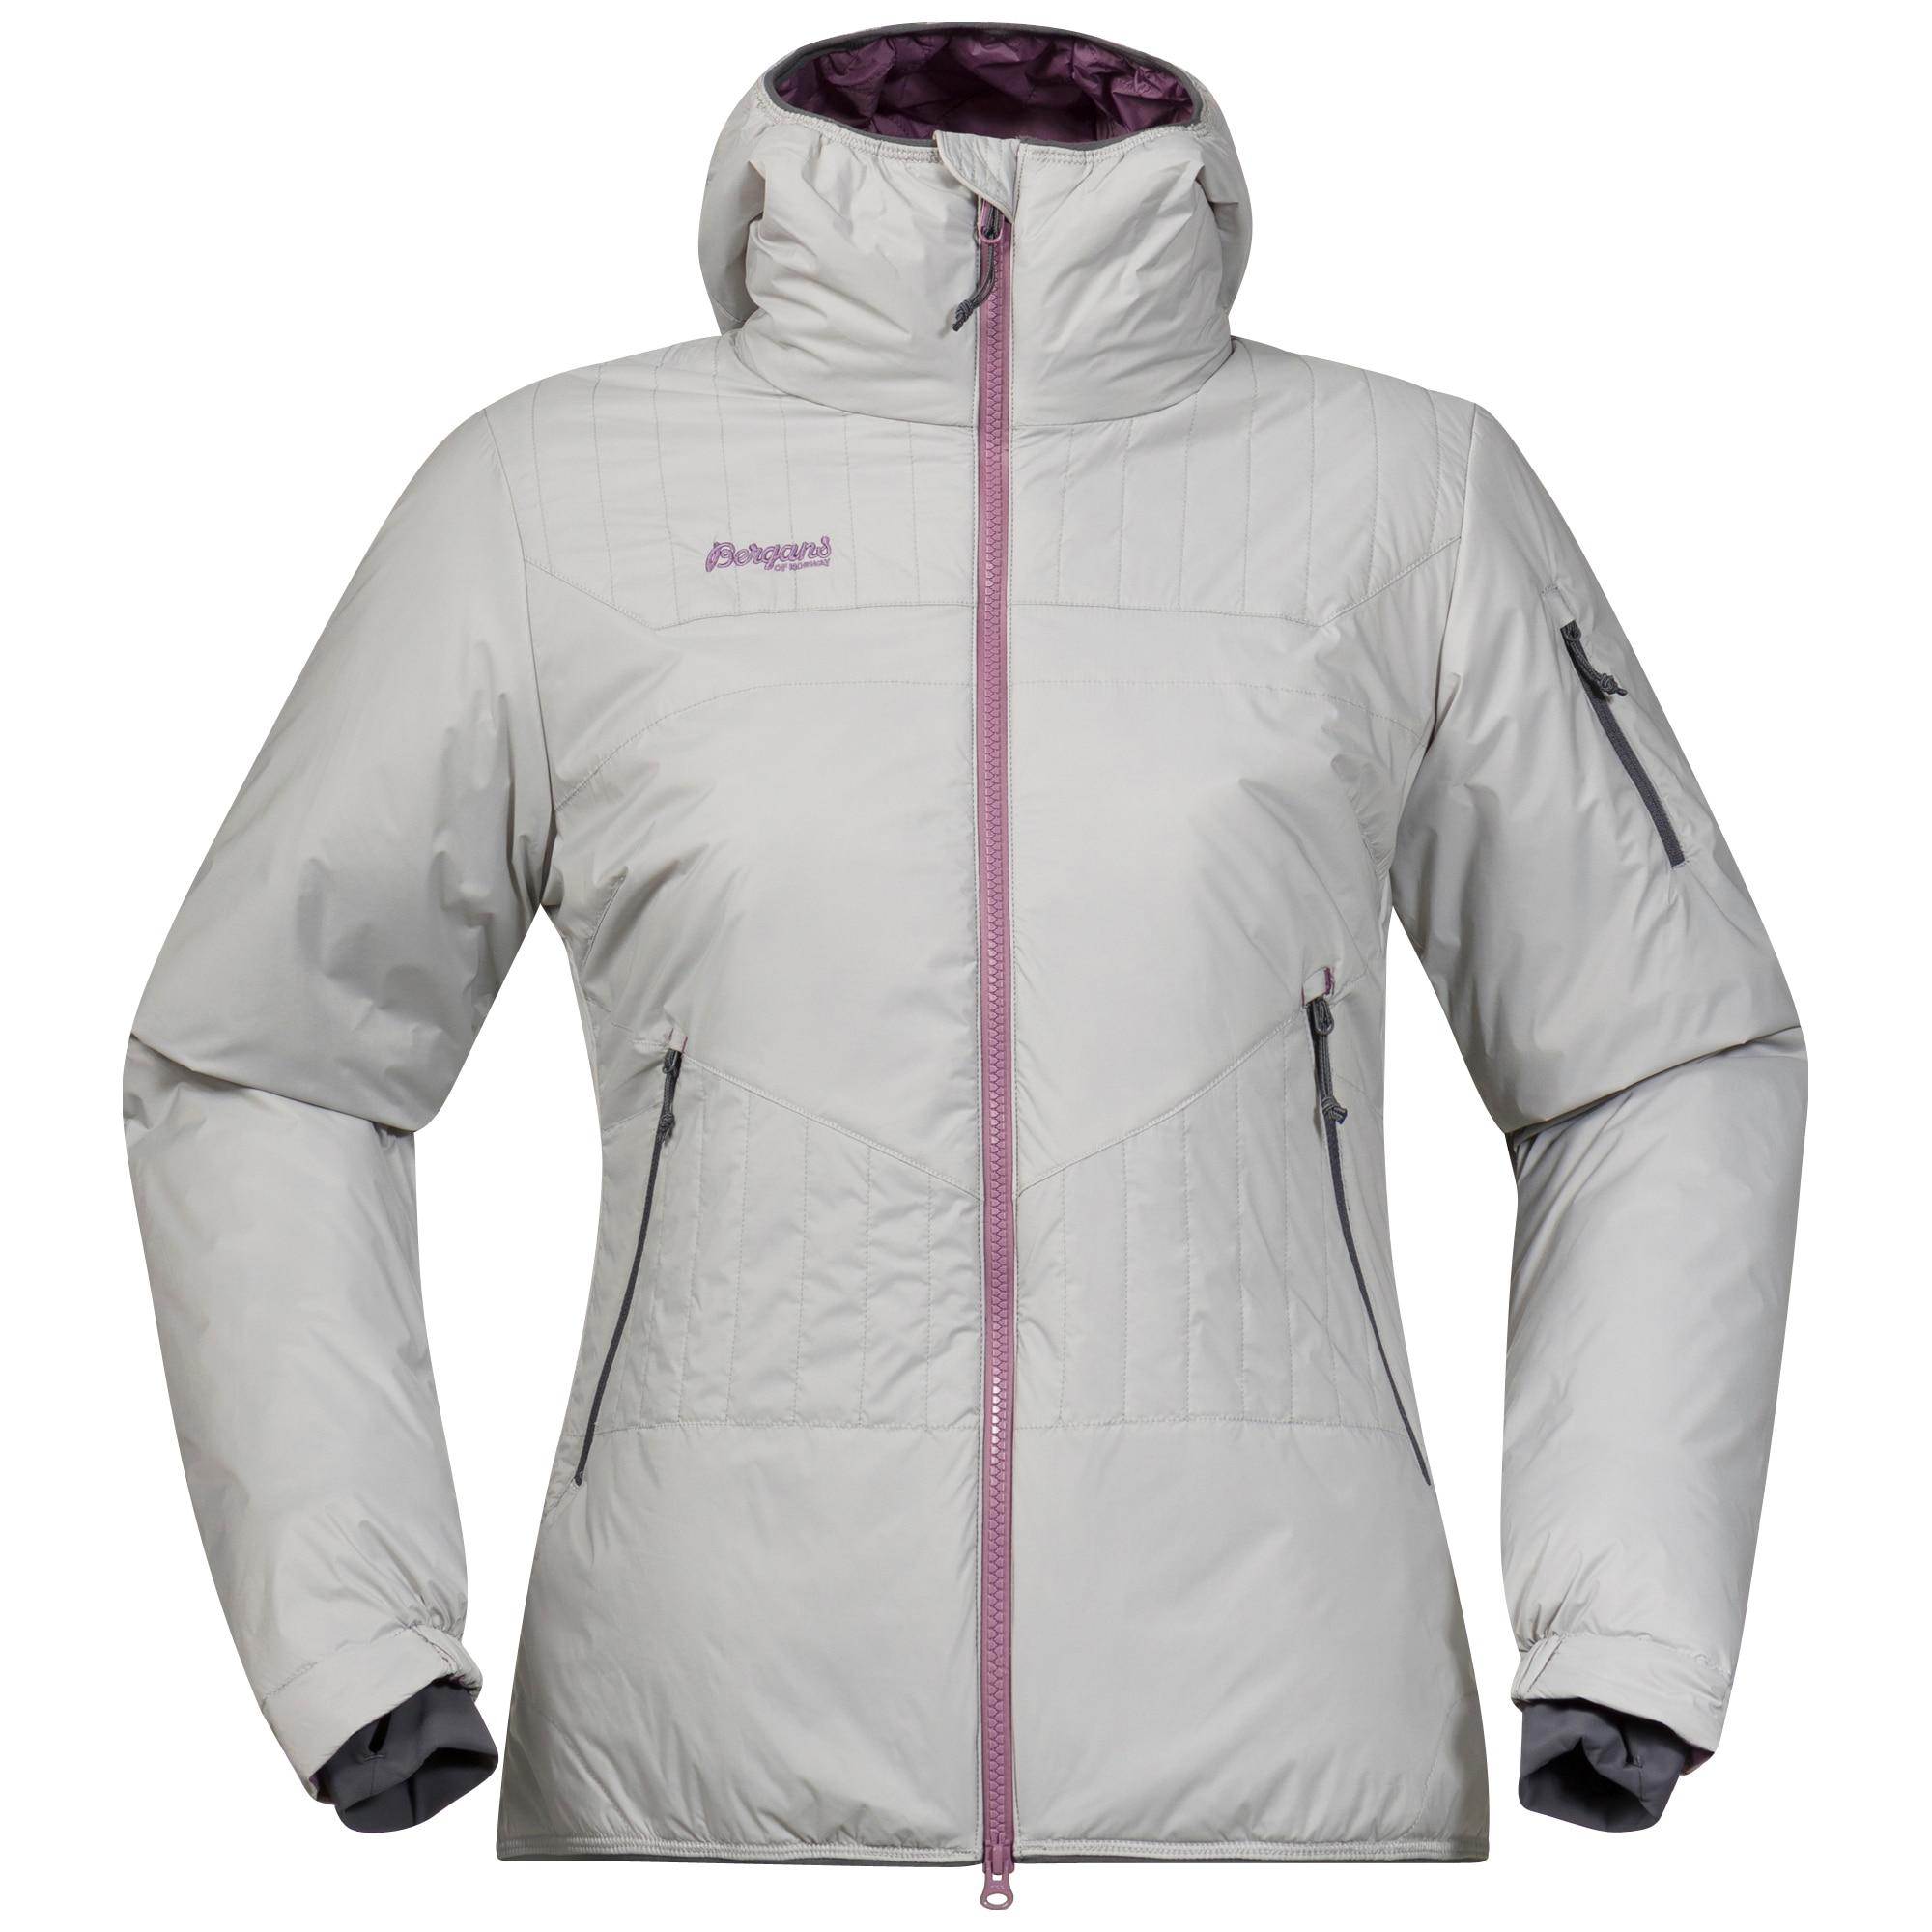 Surten Insulated Lady Jacket